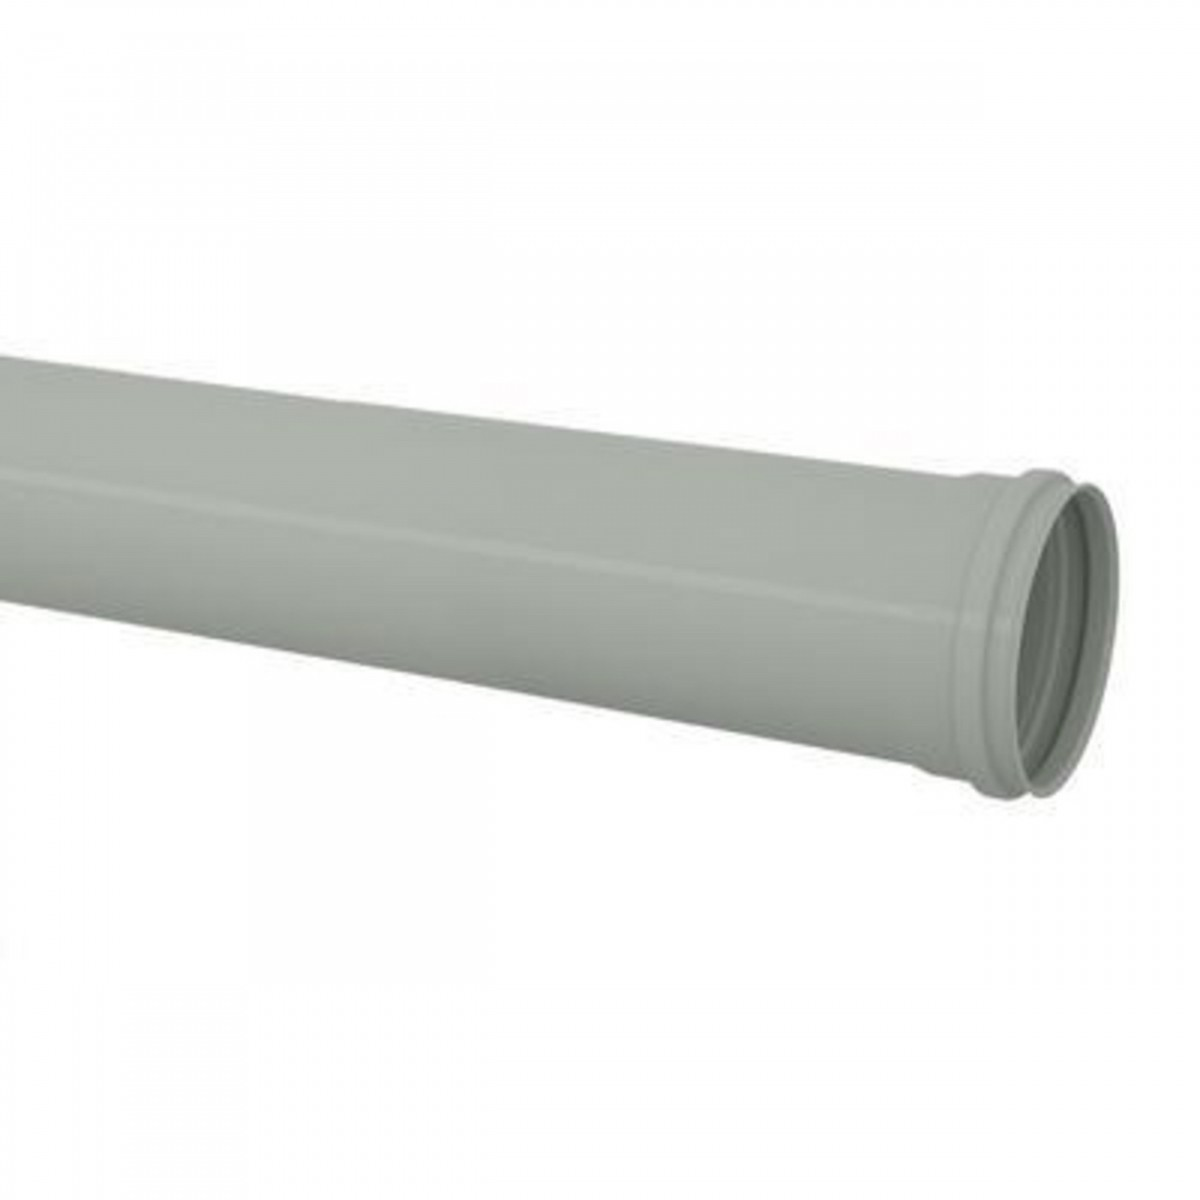 Esgoto Tubo Série R 100mm - 4